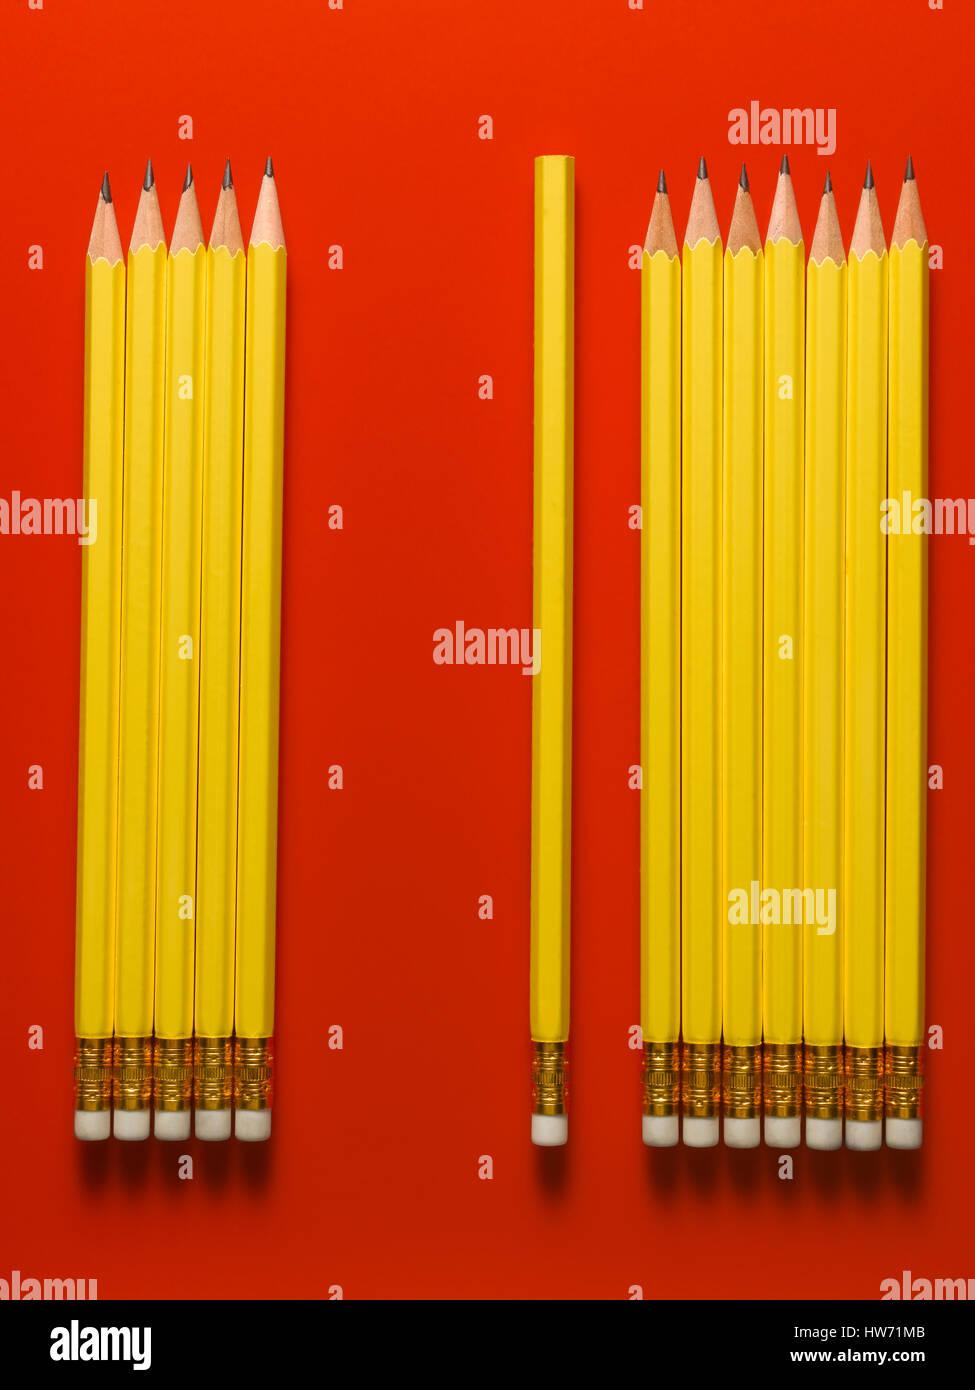 Lápiz amarillo aislado sobre un fondo rojo. Foto de stock